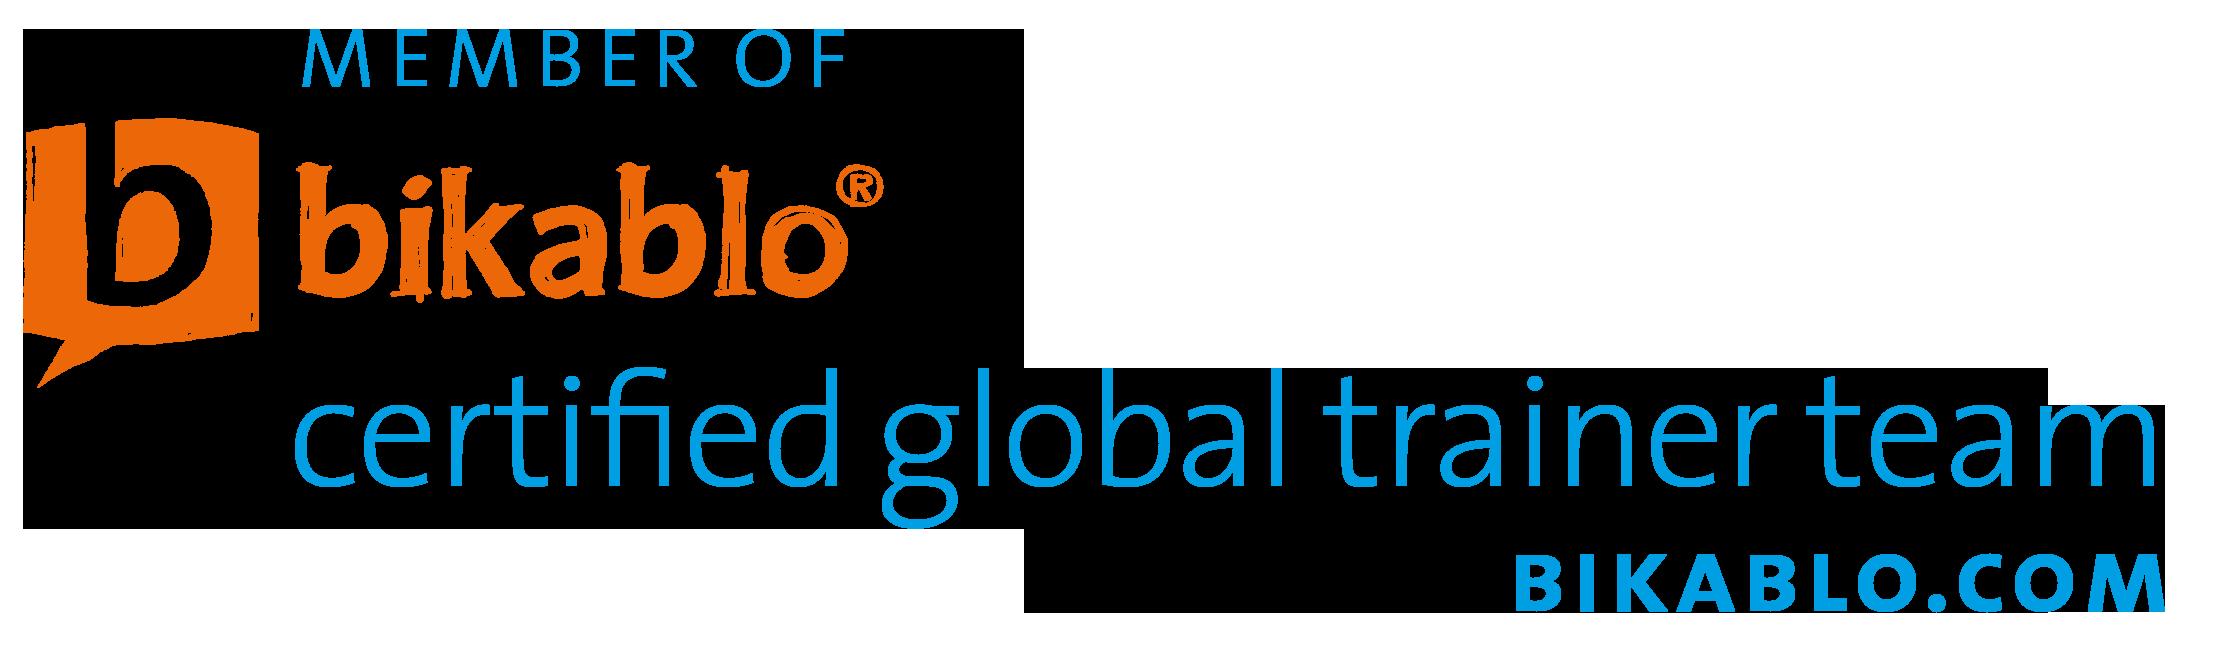 member-of-bikablo-global-trainer-team-LOGO.png